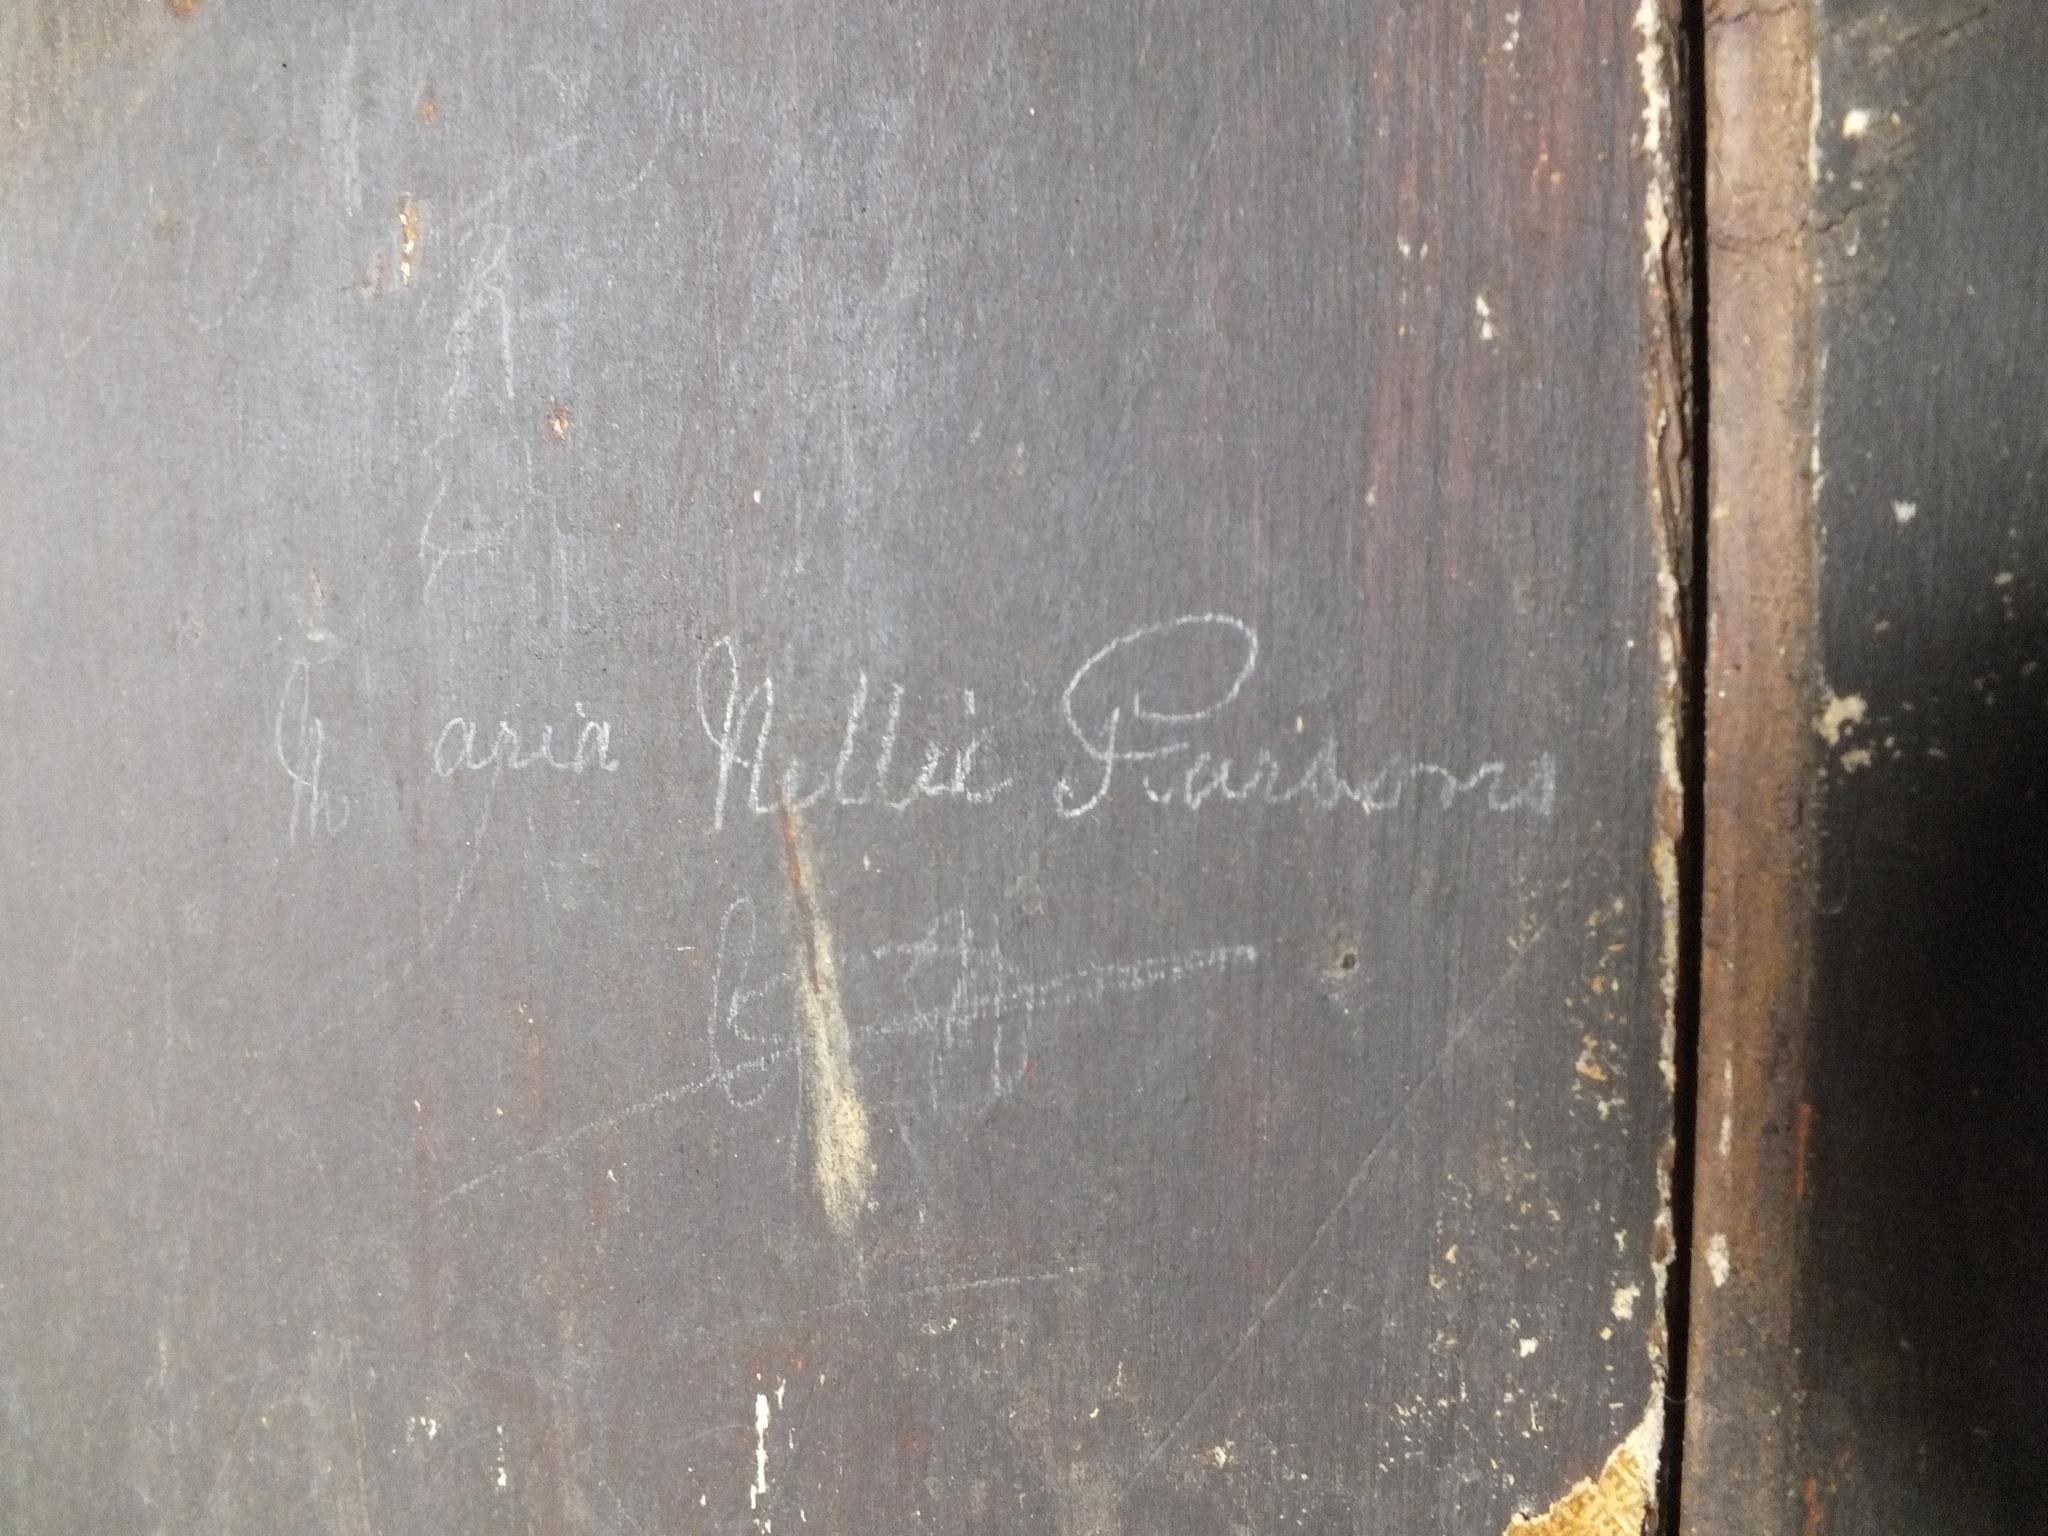 Autograph upstairs bedroom wardrobe